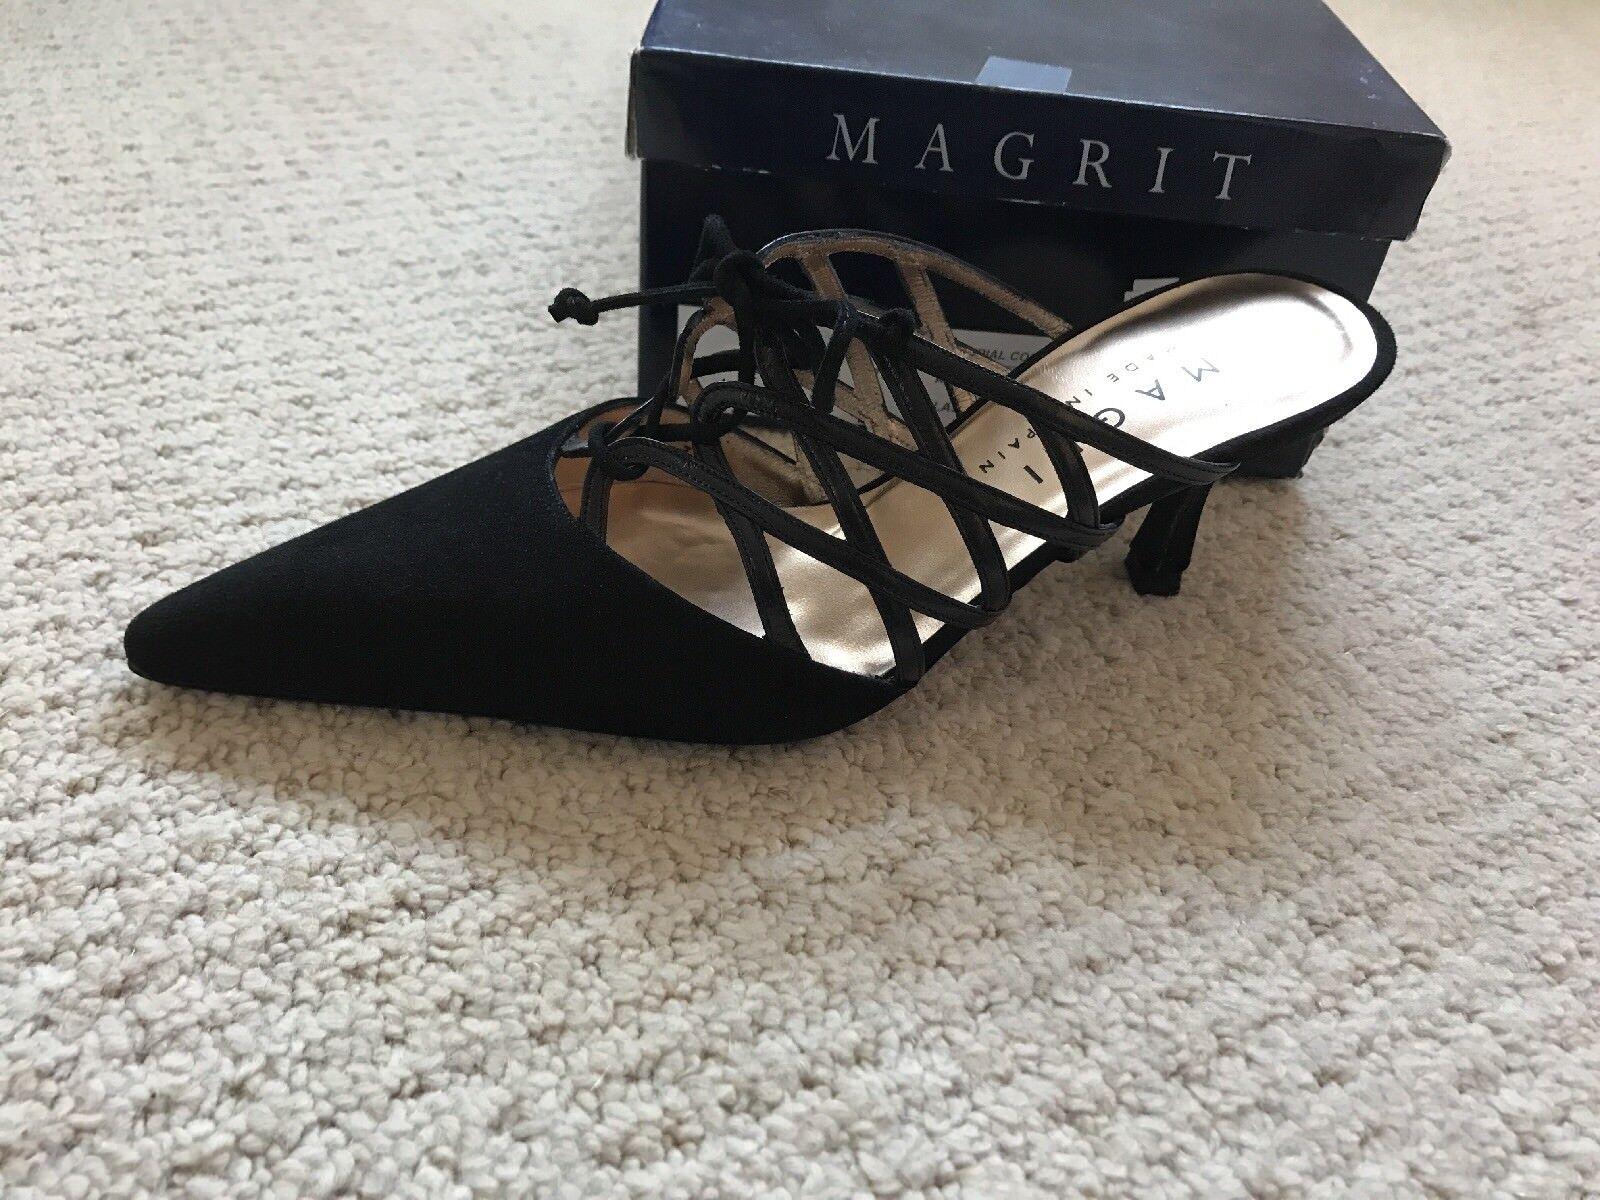 Magrit Suede Mules 37.5 (U.K. 4.5)